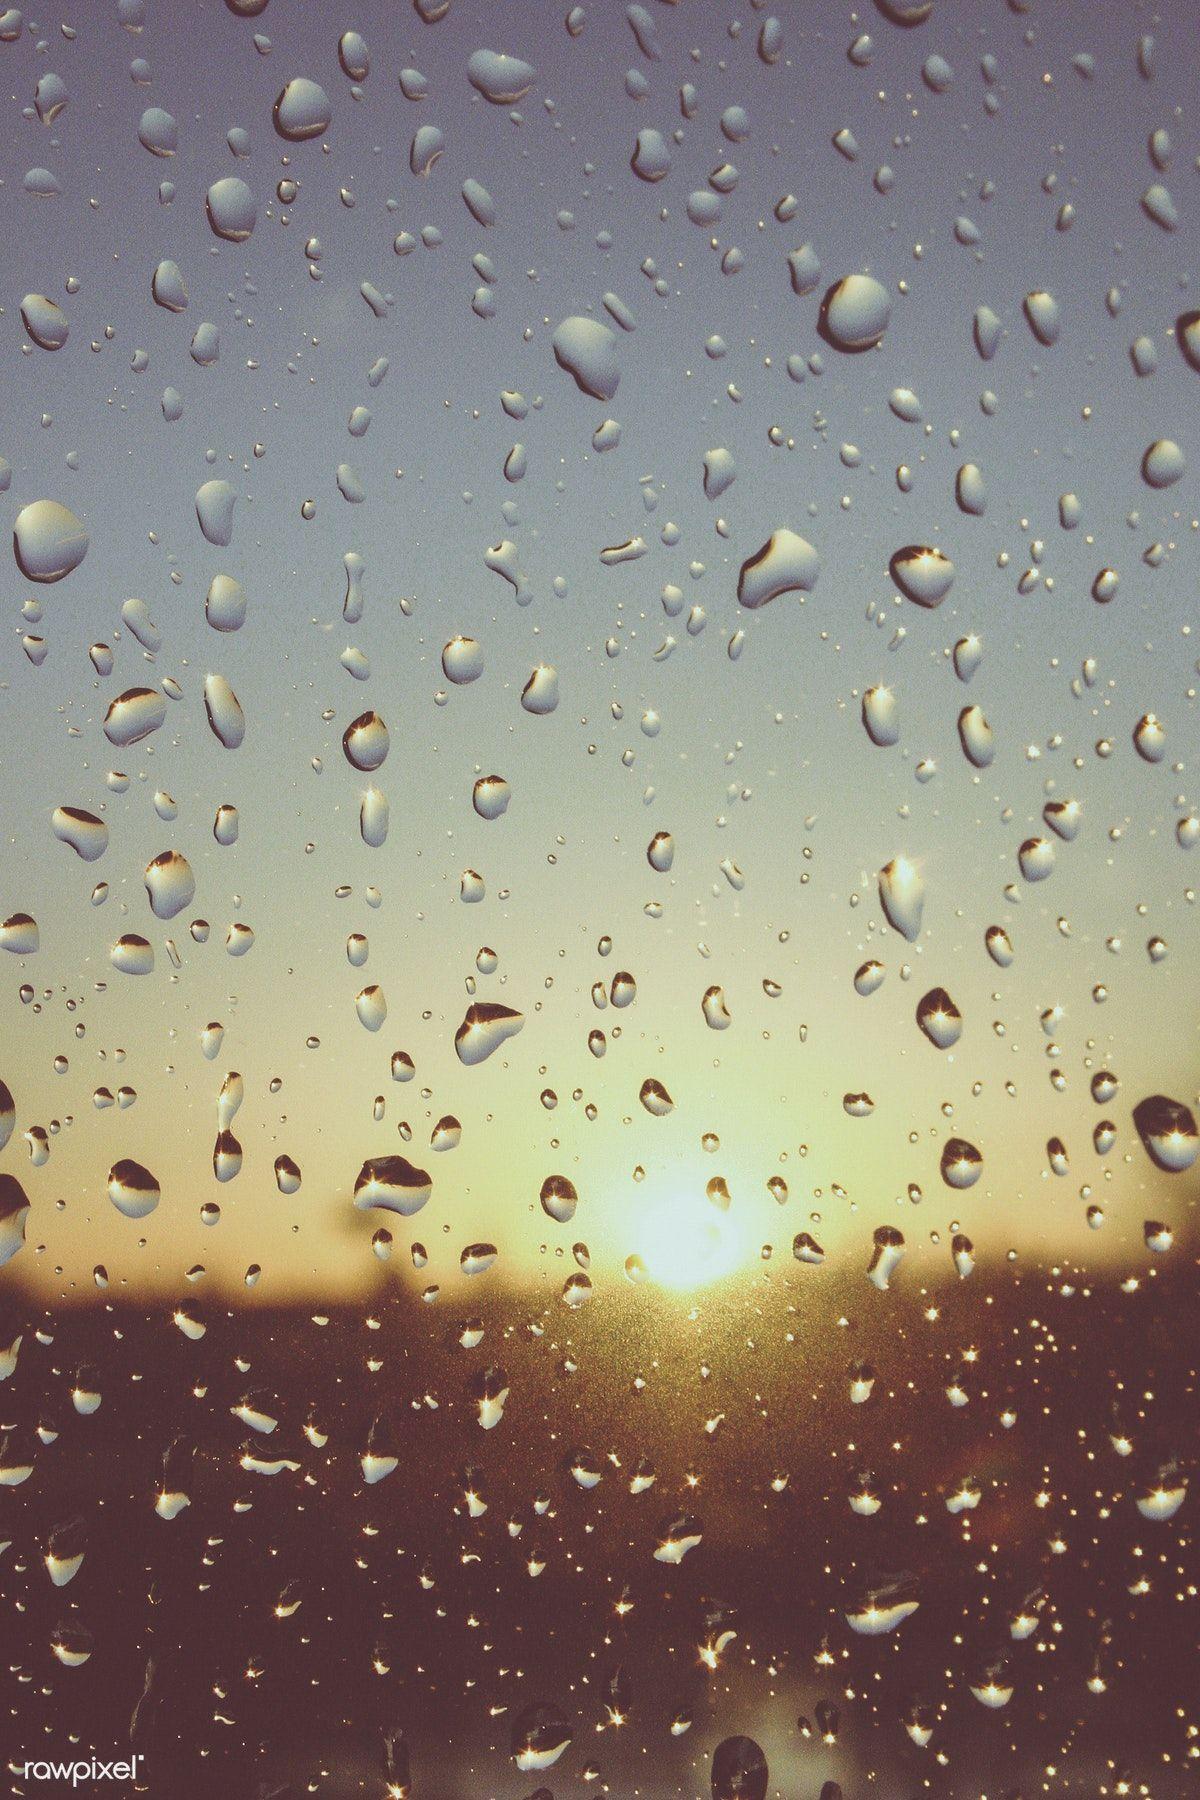 Raindrops On Window Pane Free Image By Rawpixel Com Rainy Day Photography Rain Drops On Window Rain Window